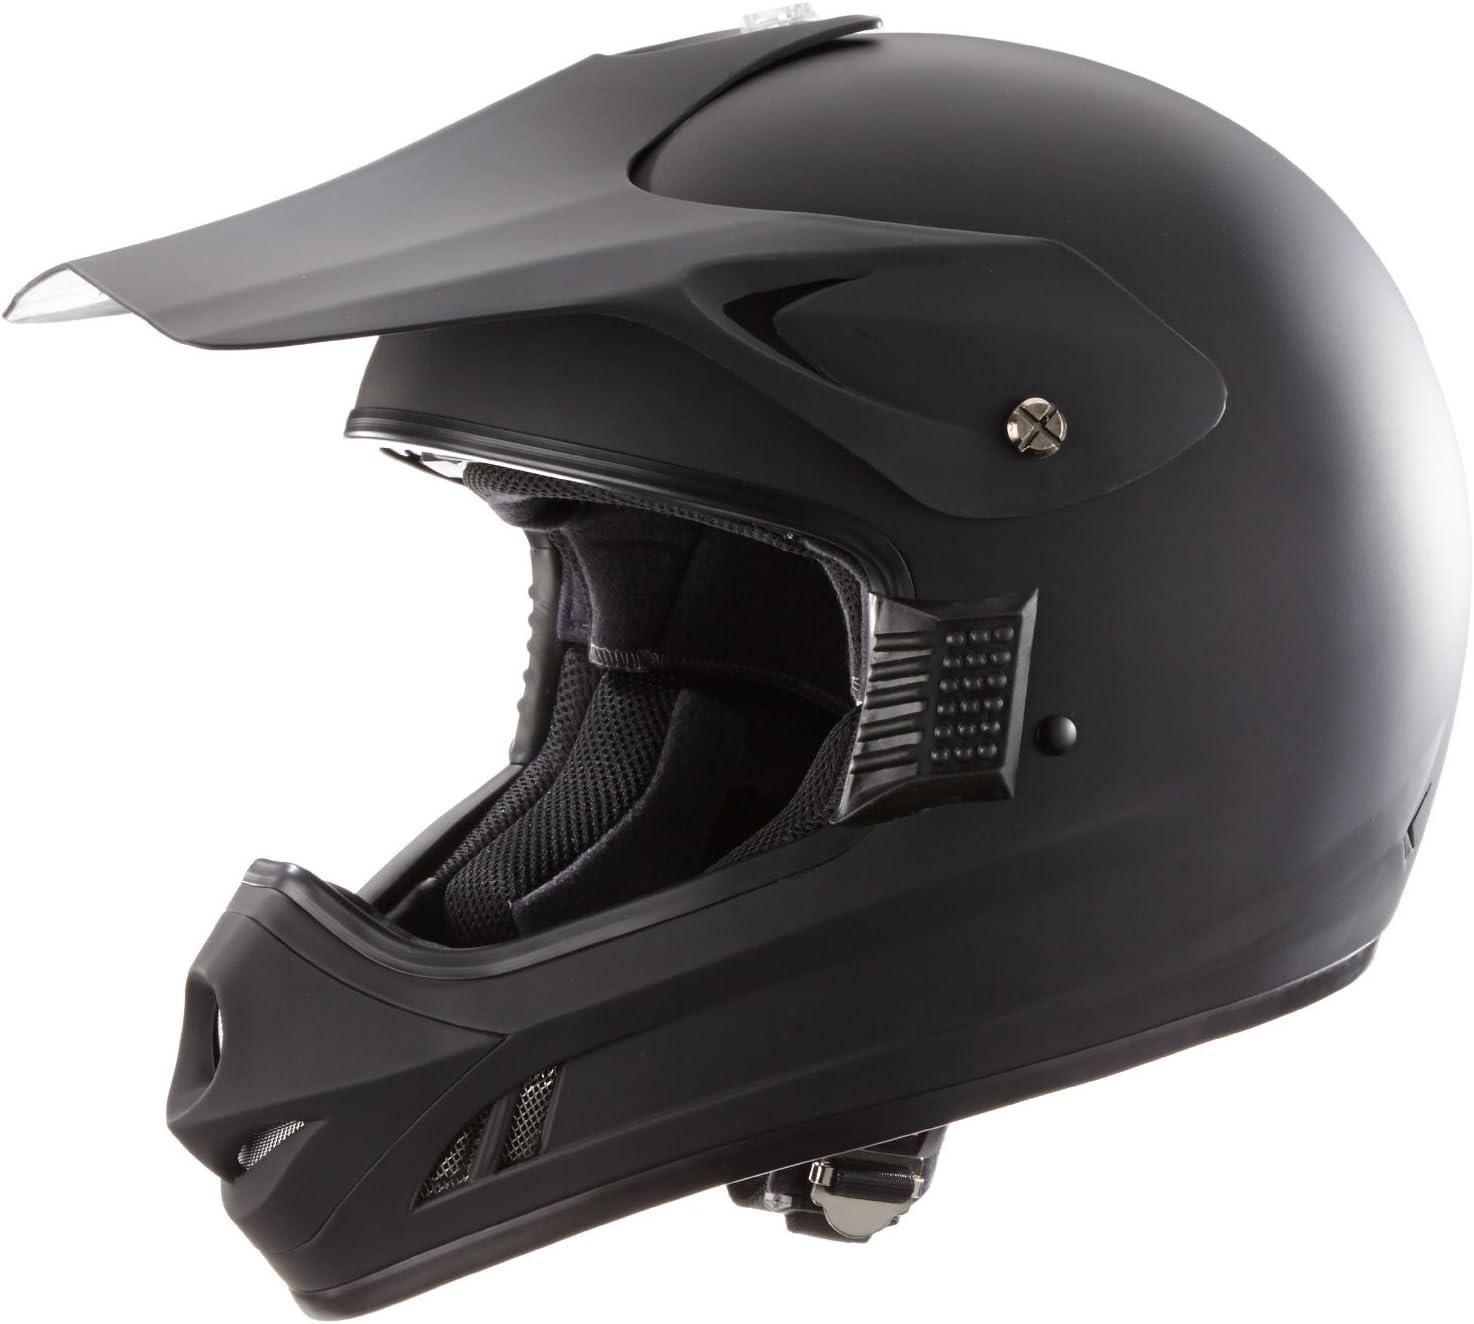 Protectwear Casque de motocross // Enduro H610-MS noir mat Taille: S